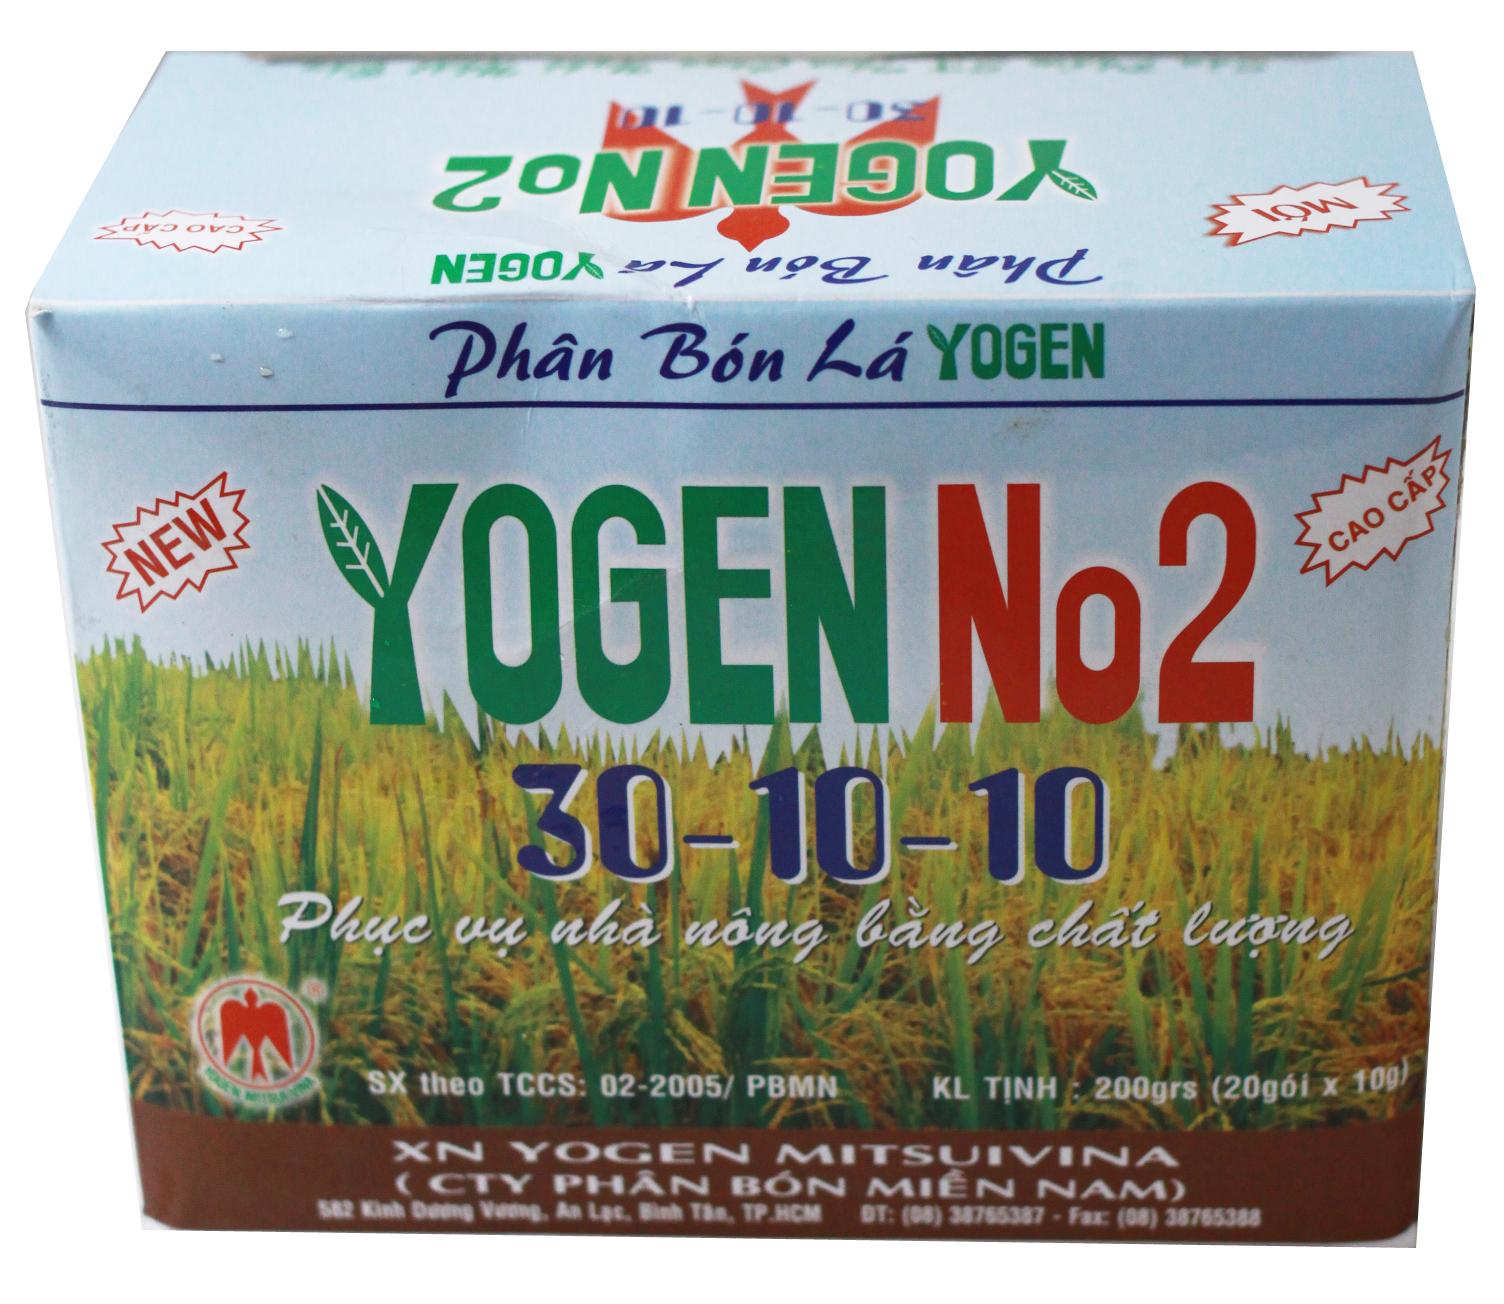 YOGEN NO2 30-10-10